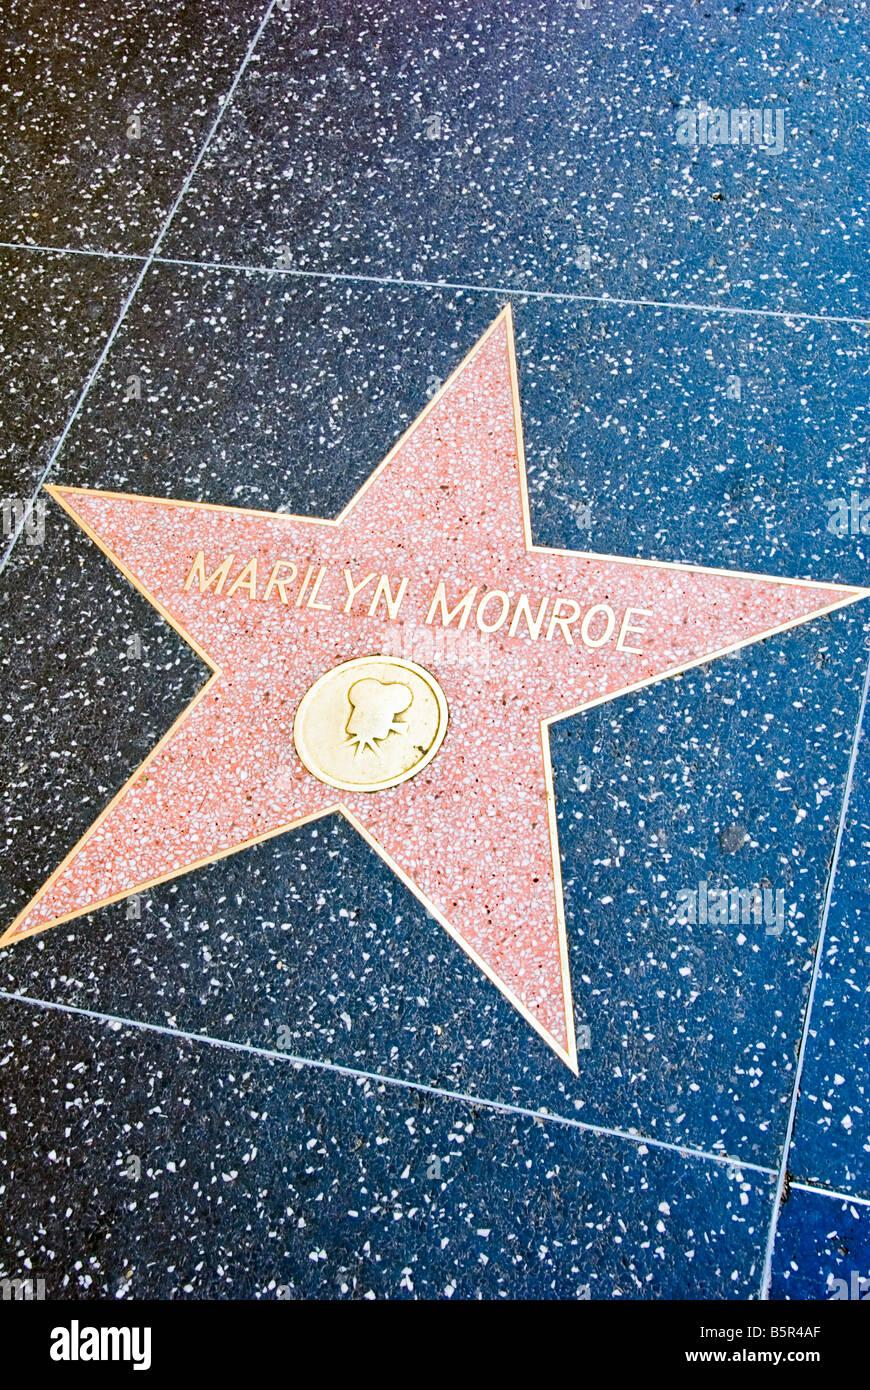 Hollywood Walk of Fame Marilyn Monroe Star Los Angeles CA - Stock Image